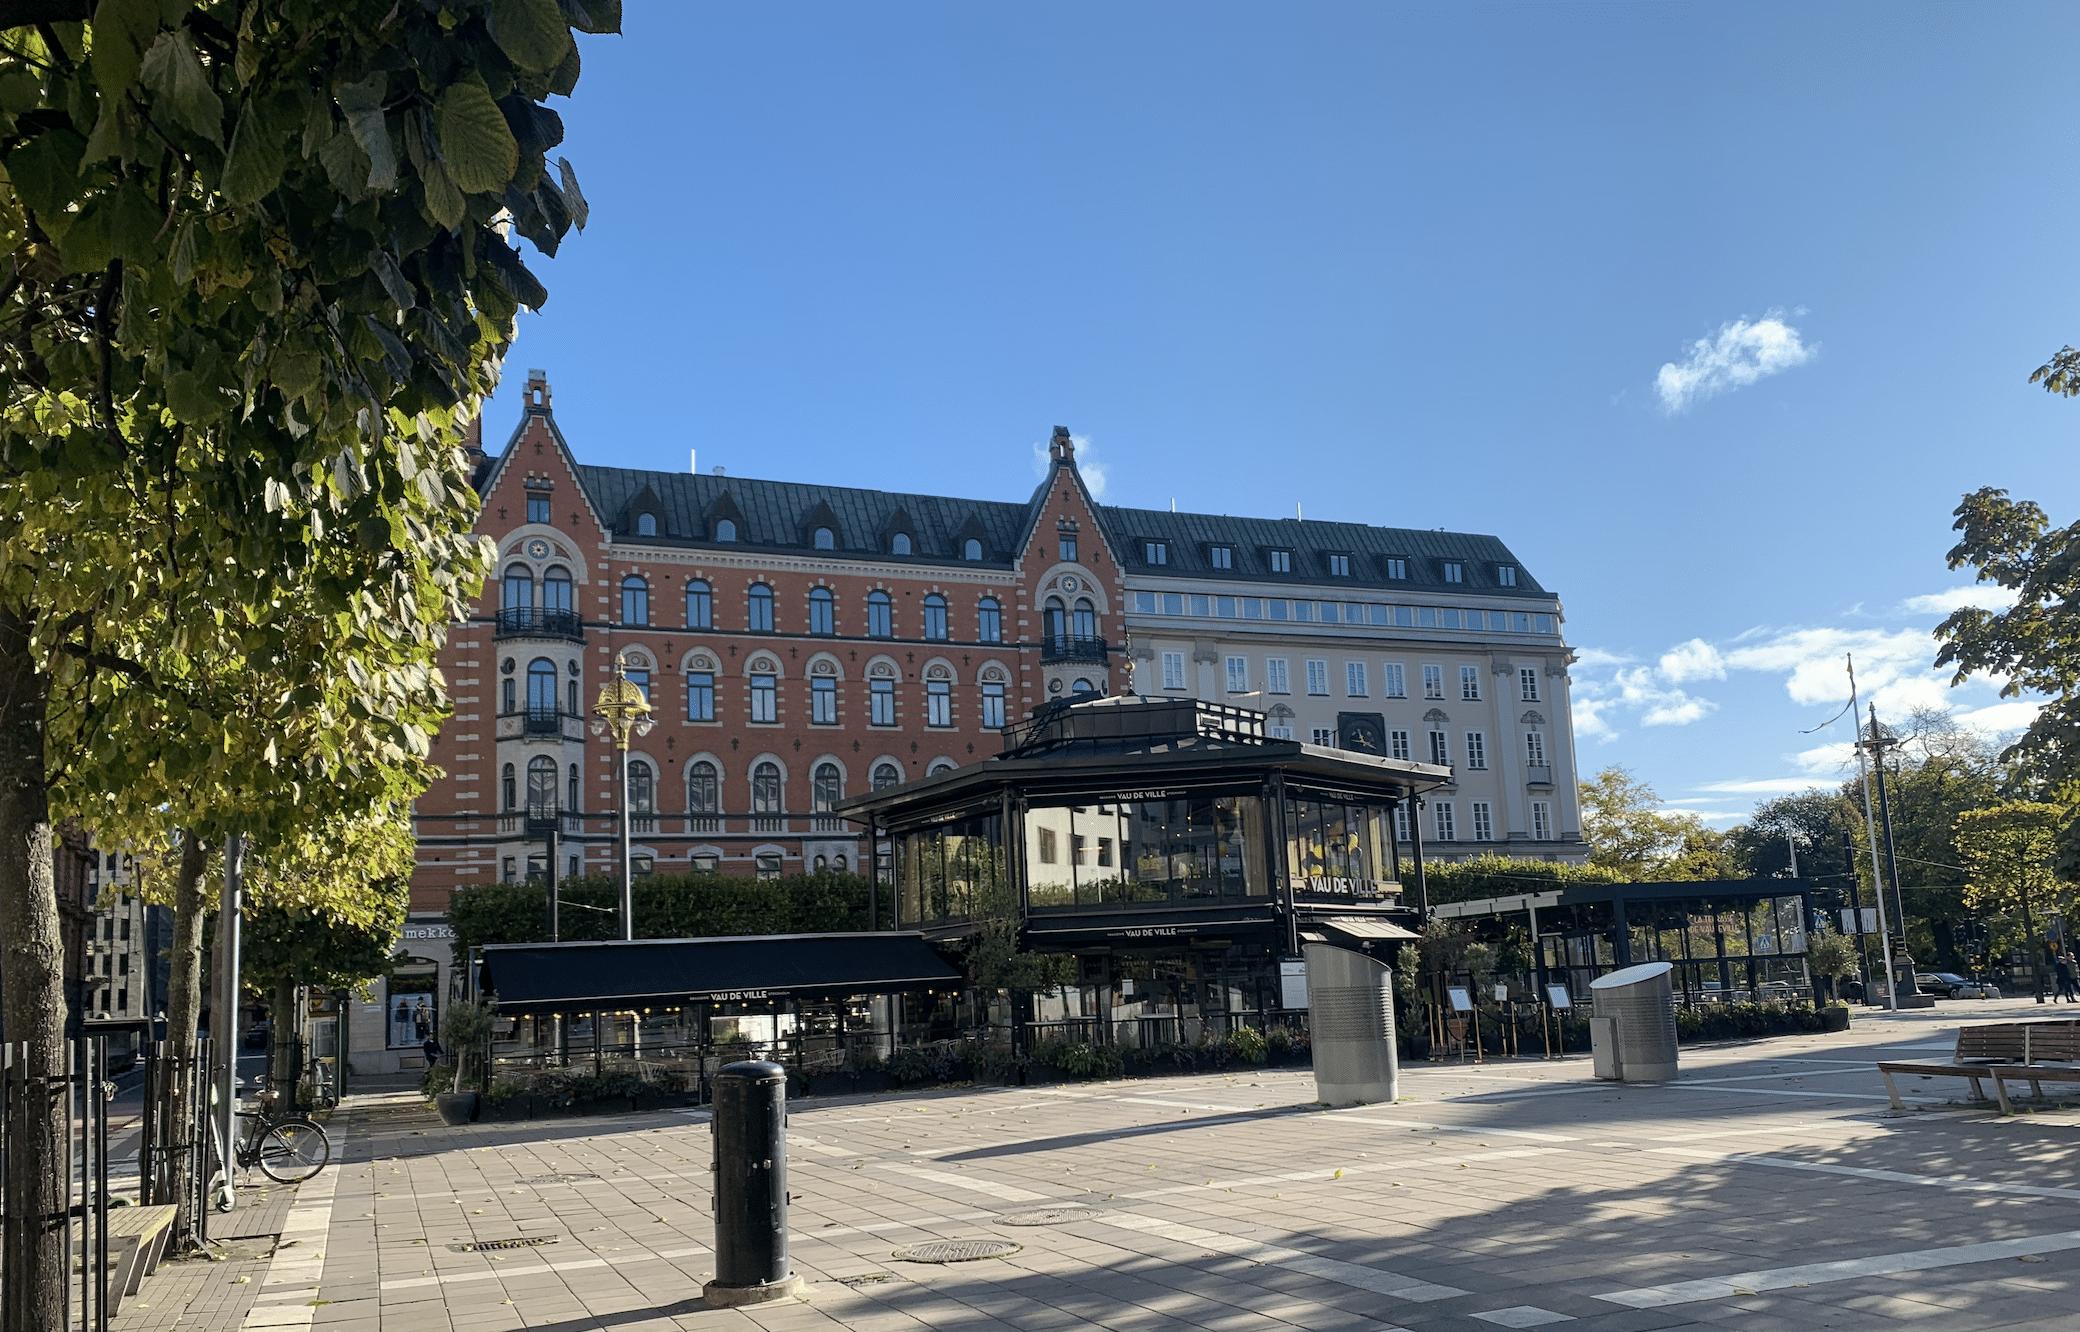 la place de norrmalmstorg